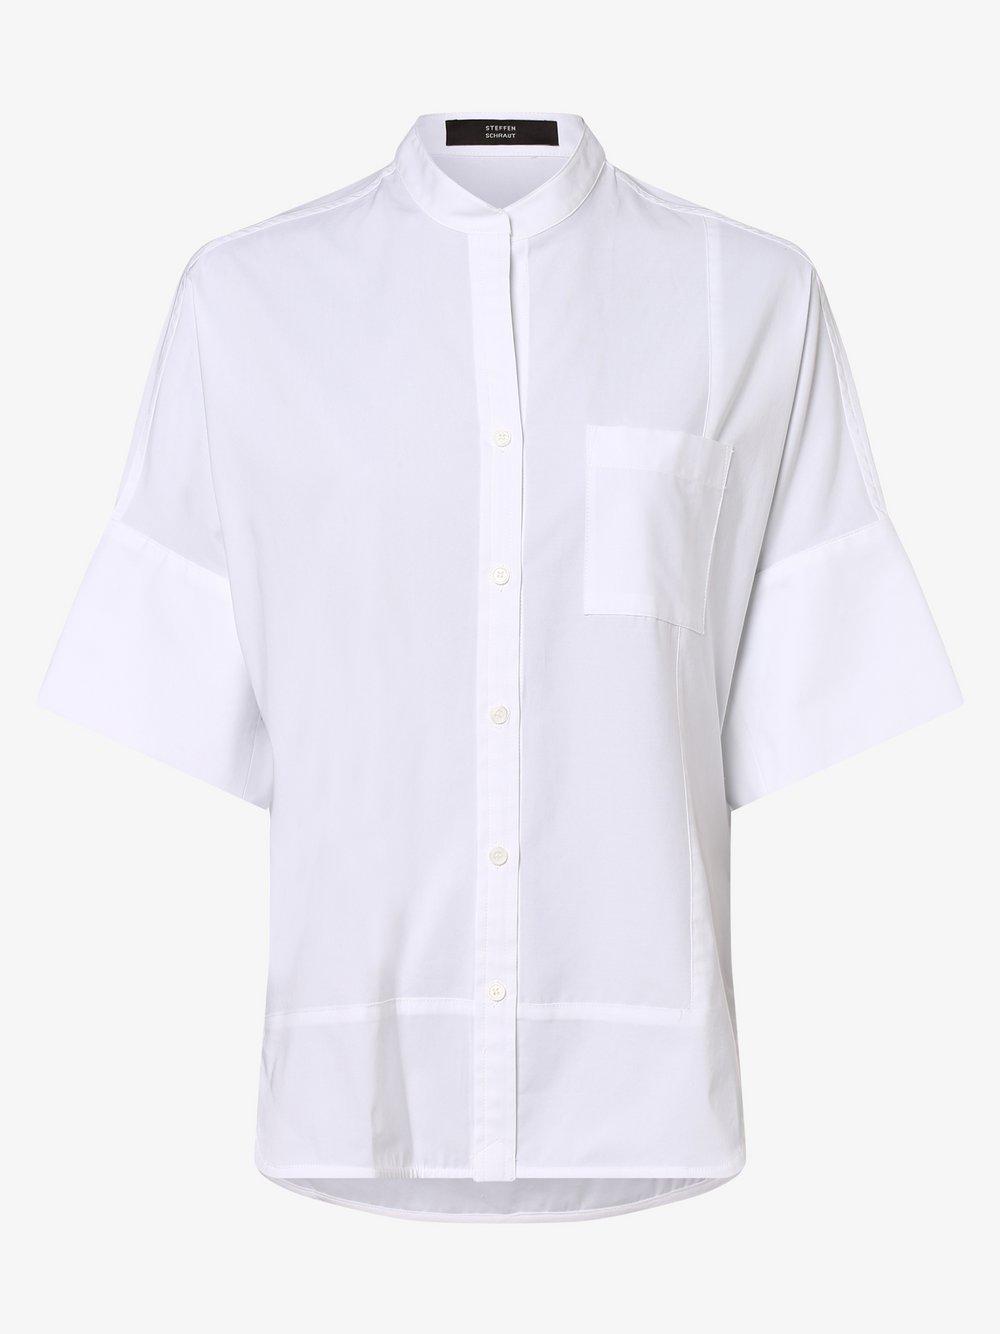 STEFFEN SCHRAUT – Bluzka damska, biały Van Graaf 462216-0001